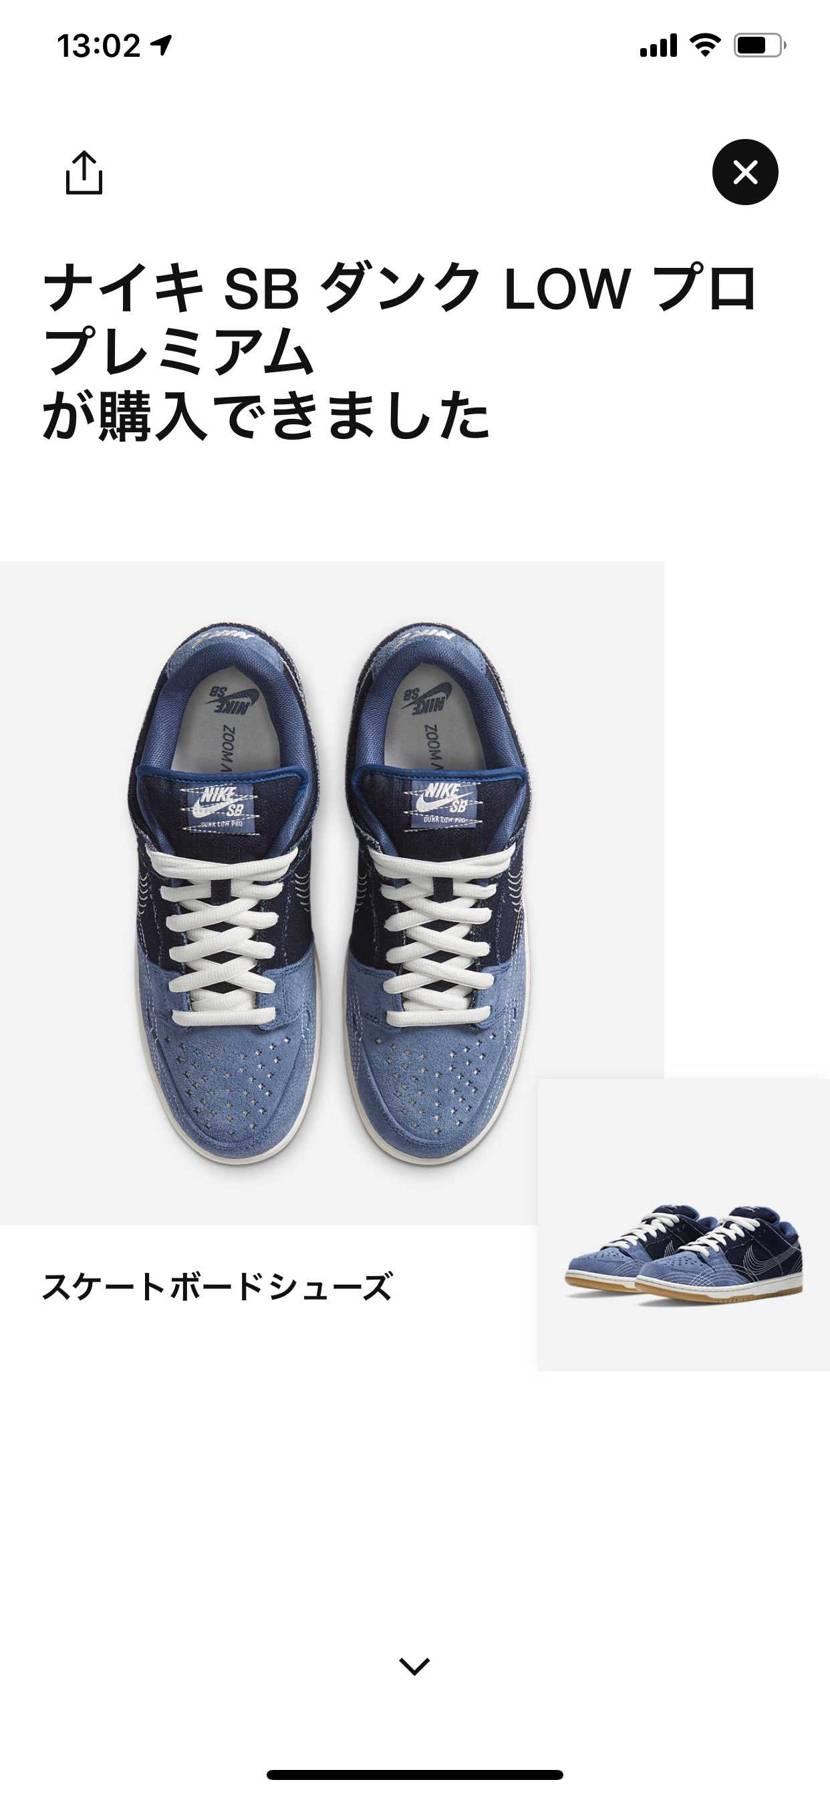 Nike.comで買えました👏👏 #snkrdunk